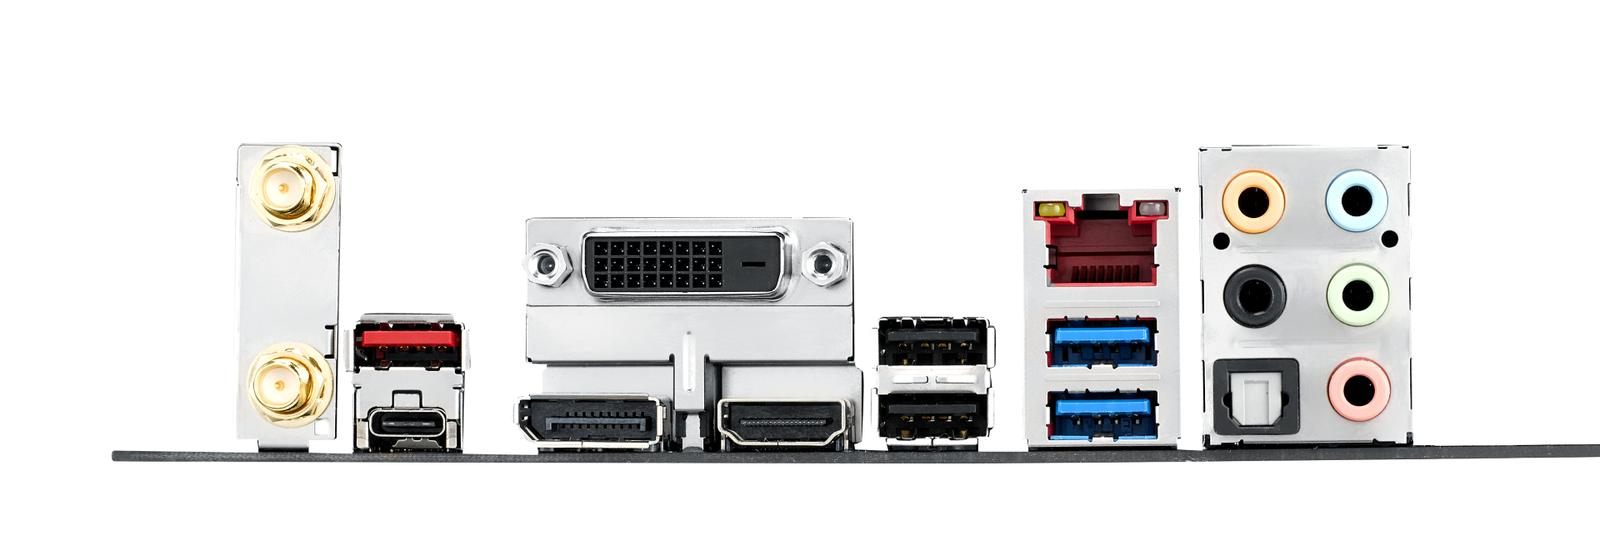 Asus ROG STRIX Z370-E GAMING ATX LGA 1151